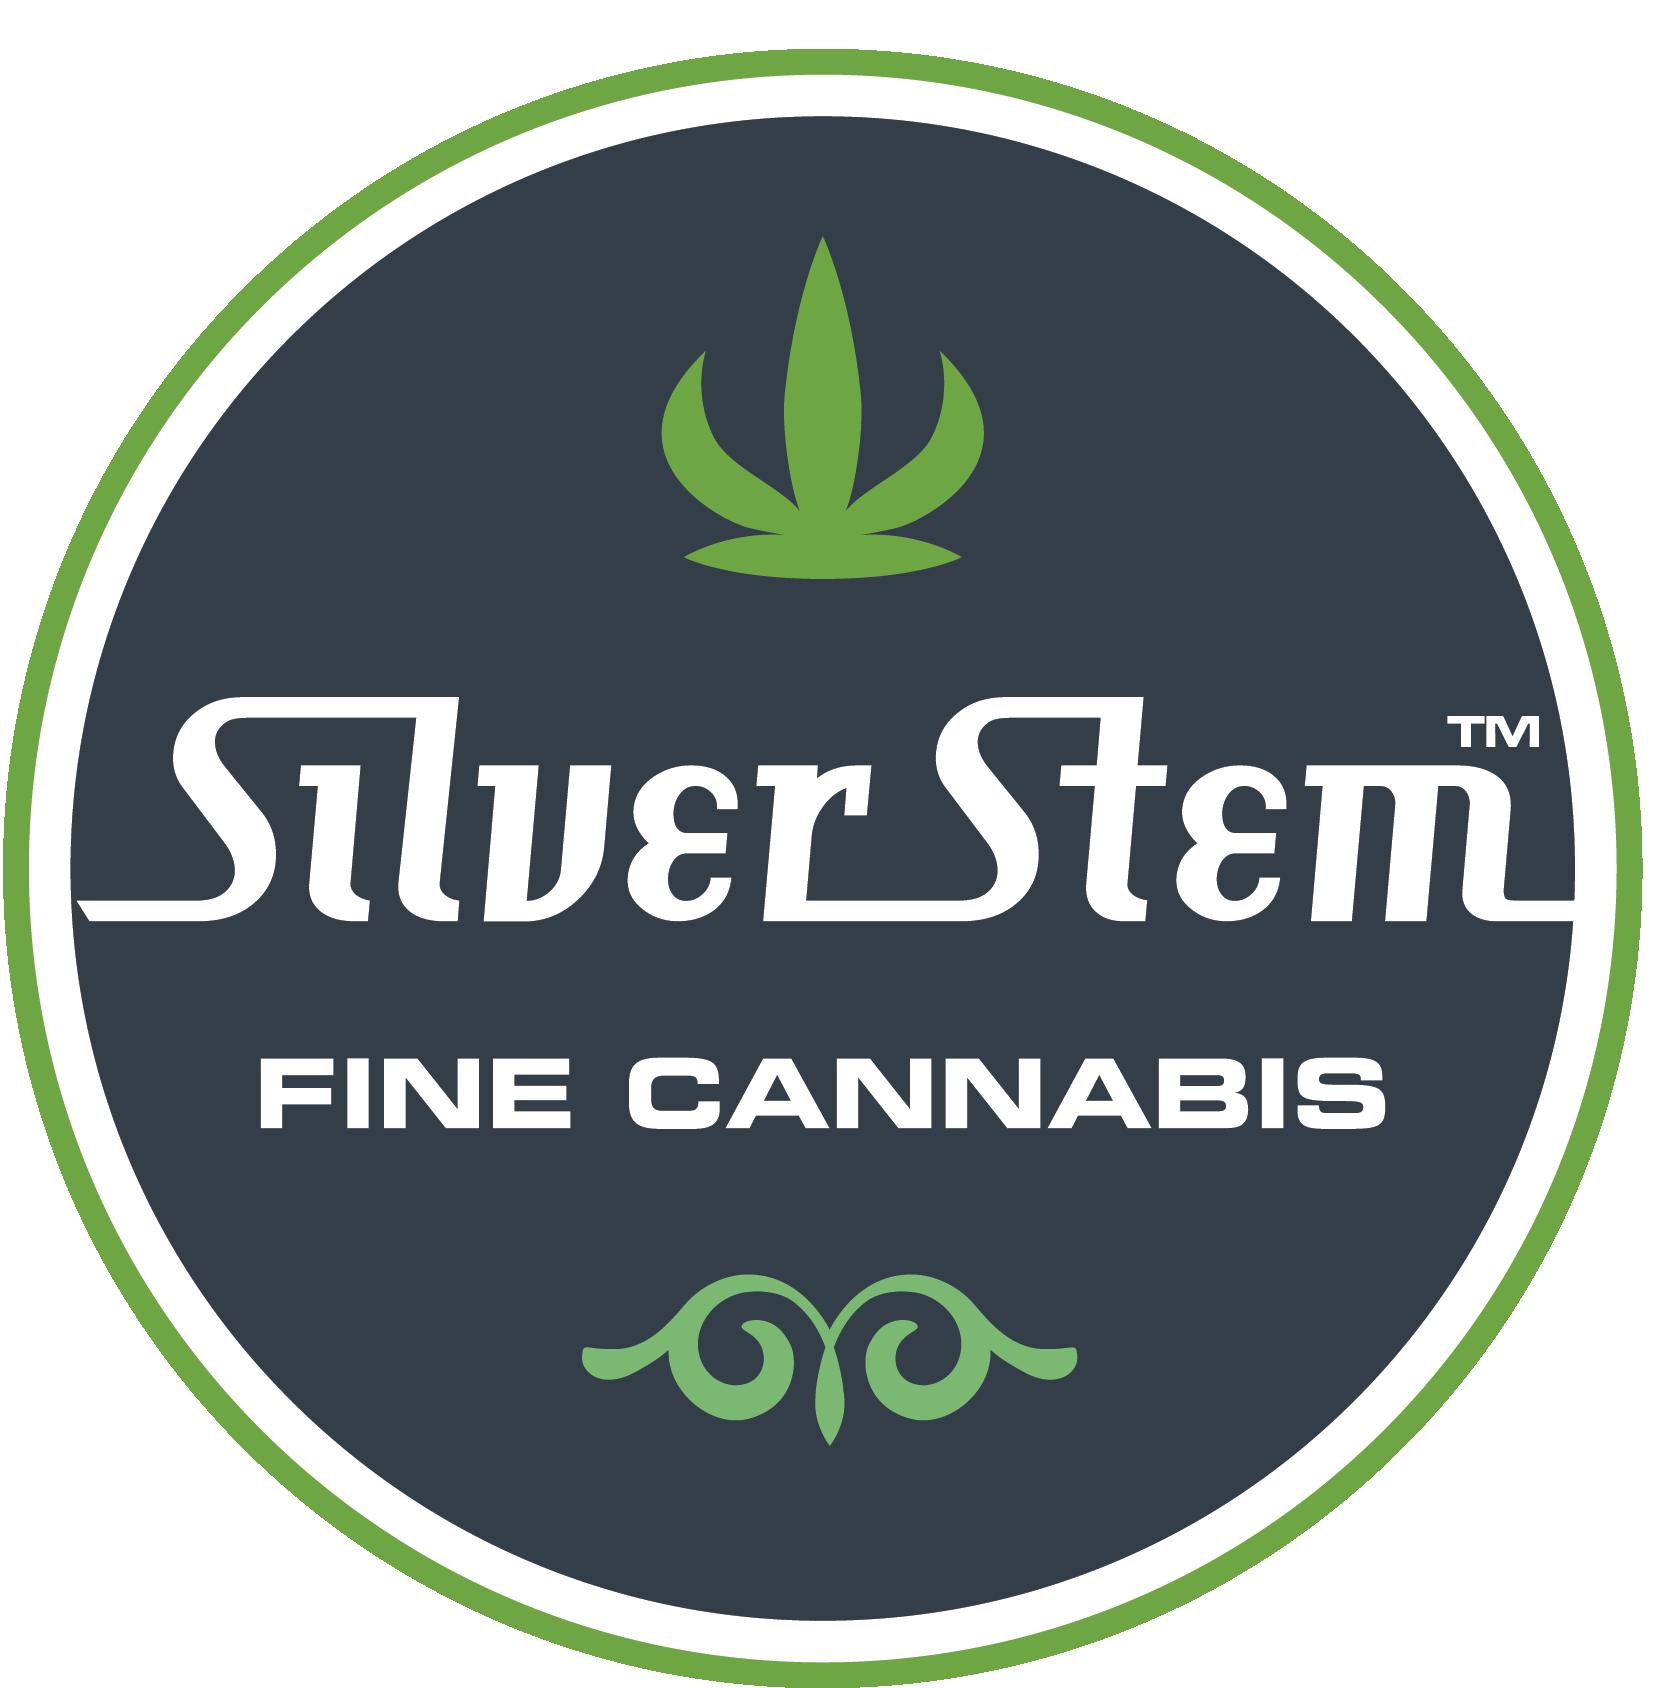 silverstem logo3